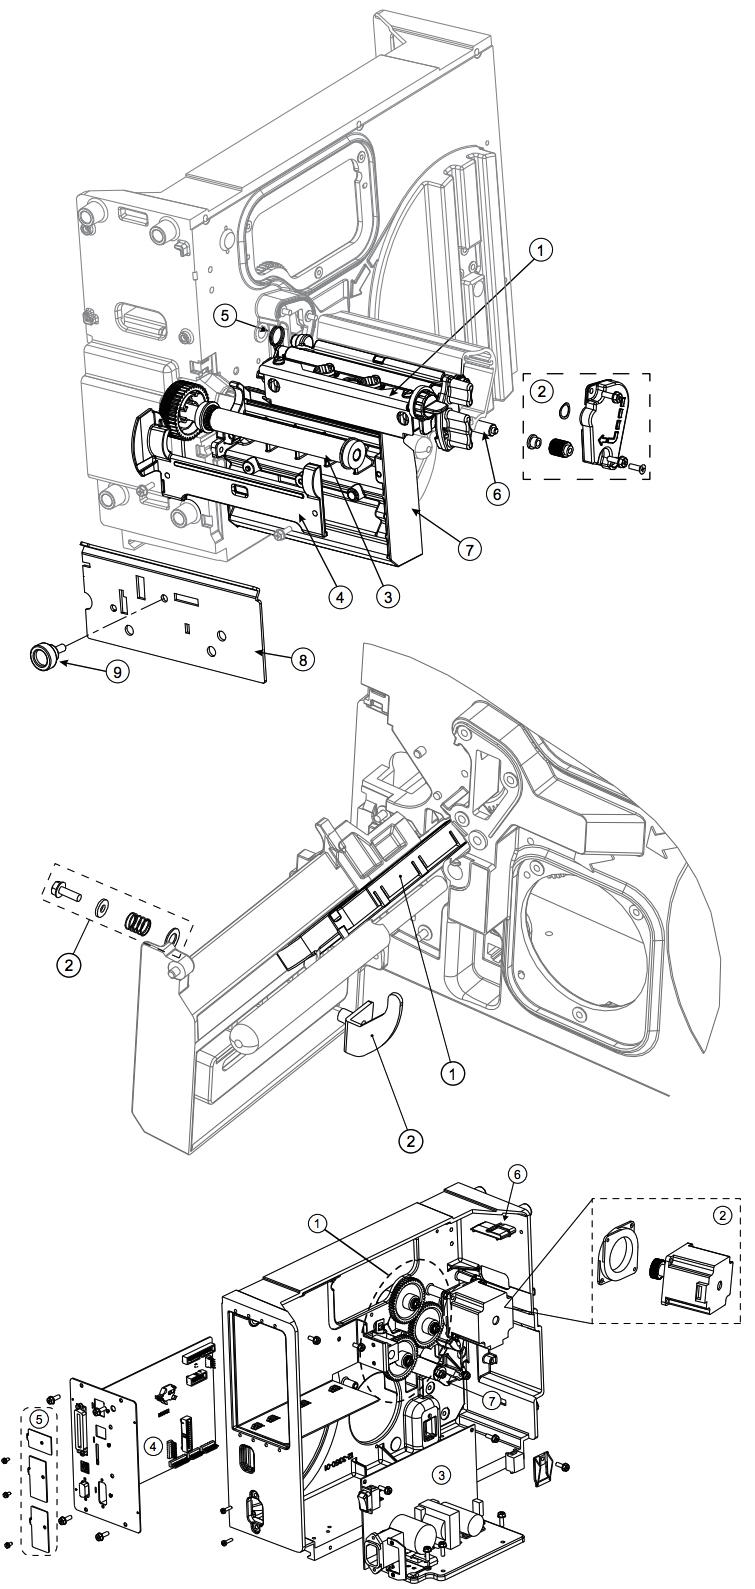 механизм принтера i-class mark ii